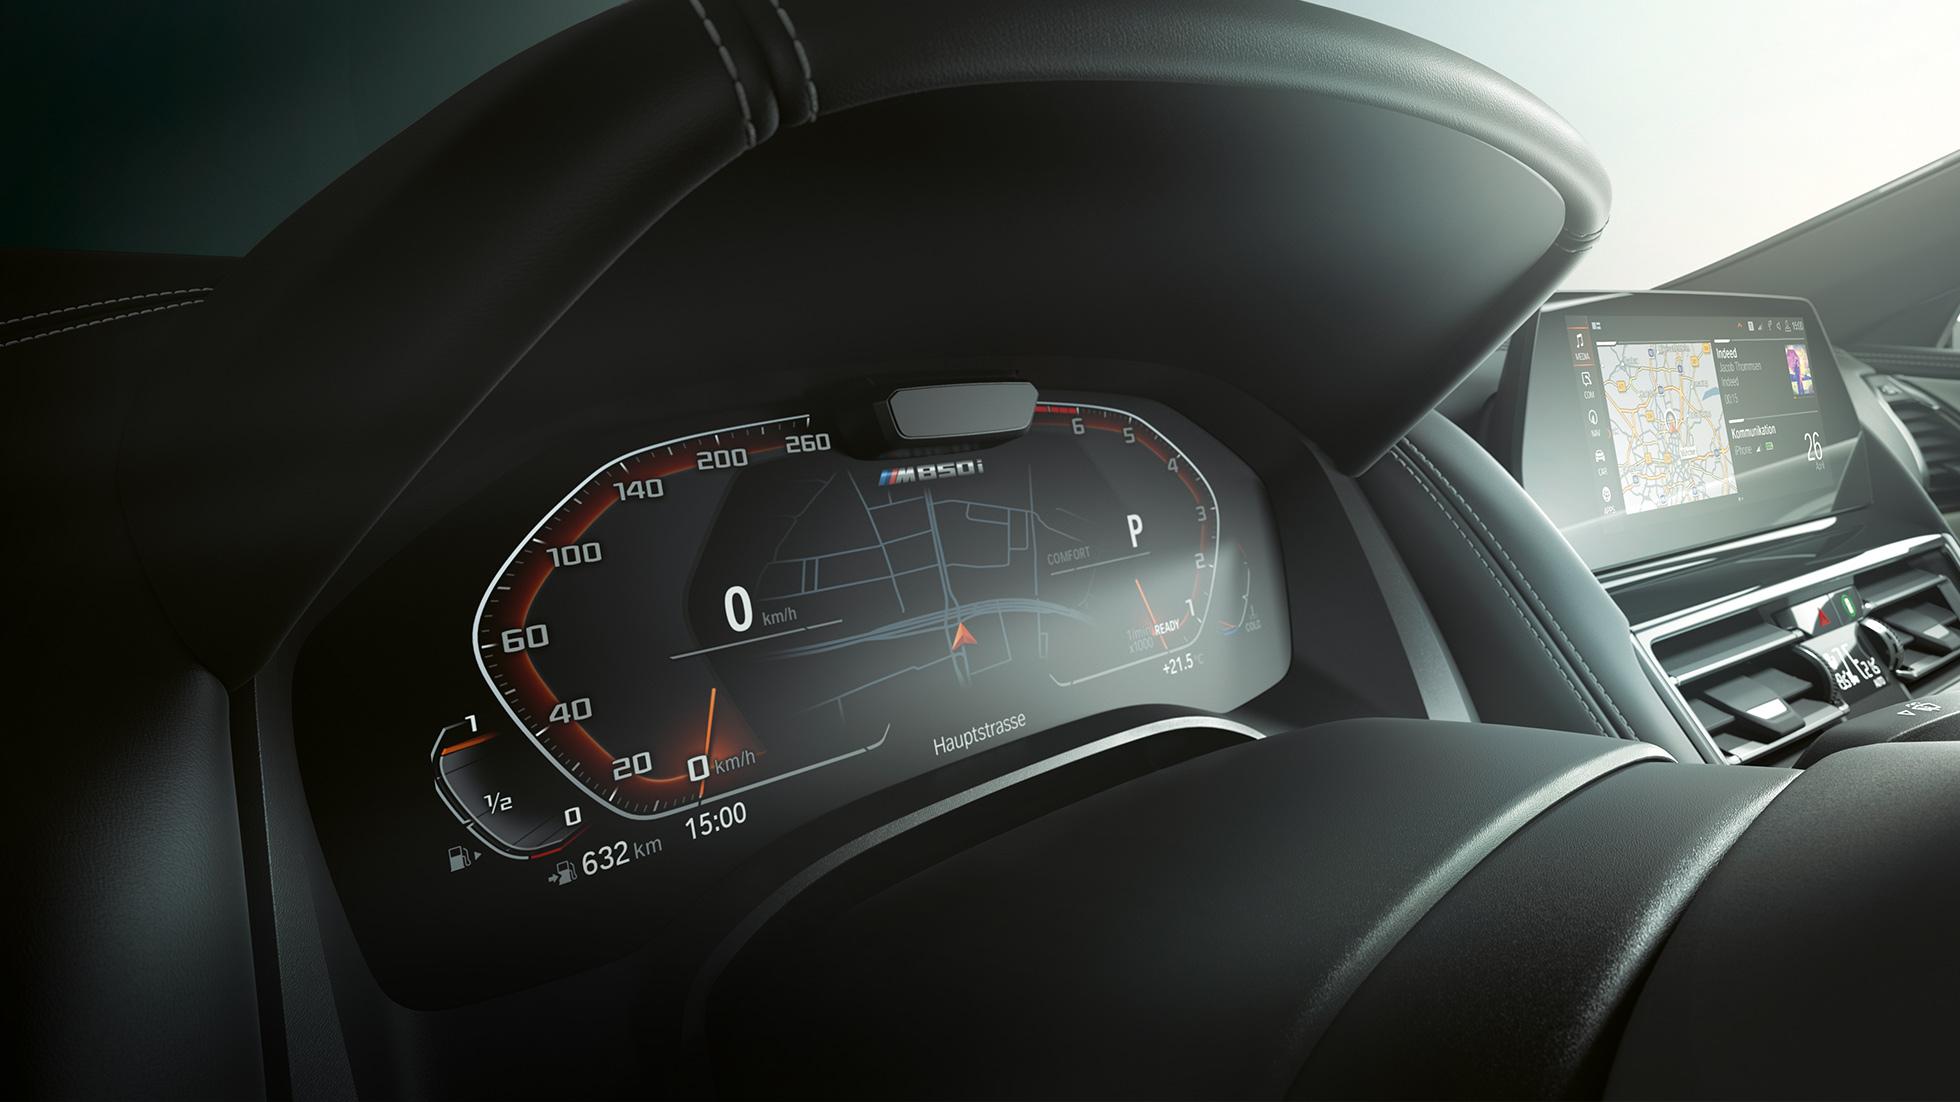 BMW M850i xDrive, панель приборов, пакет систем помощи водителю.